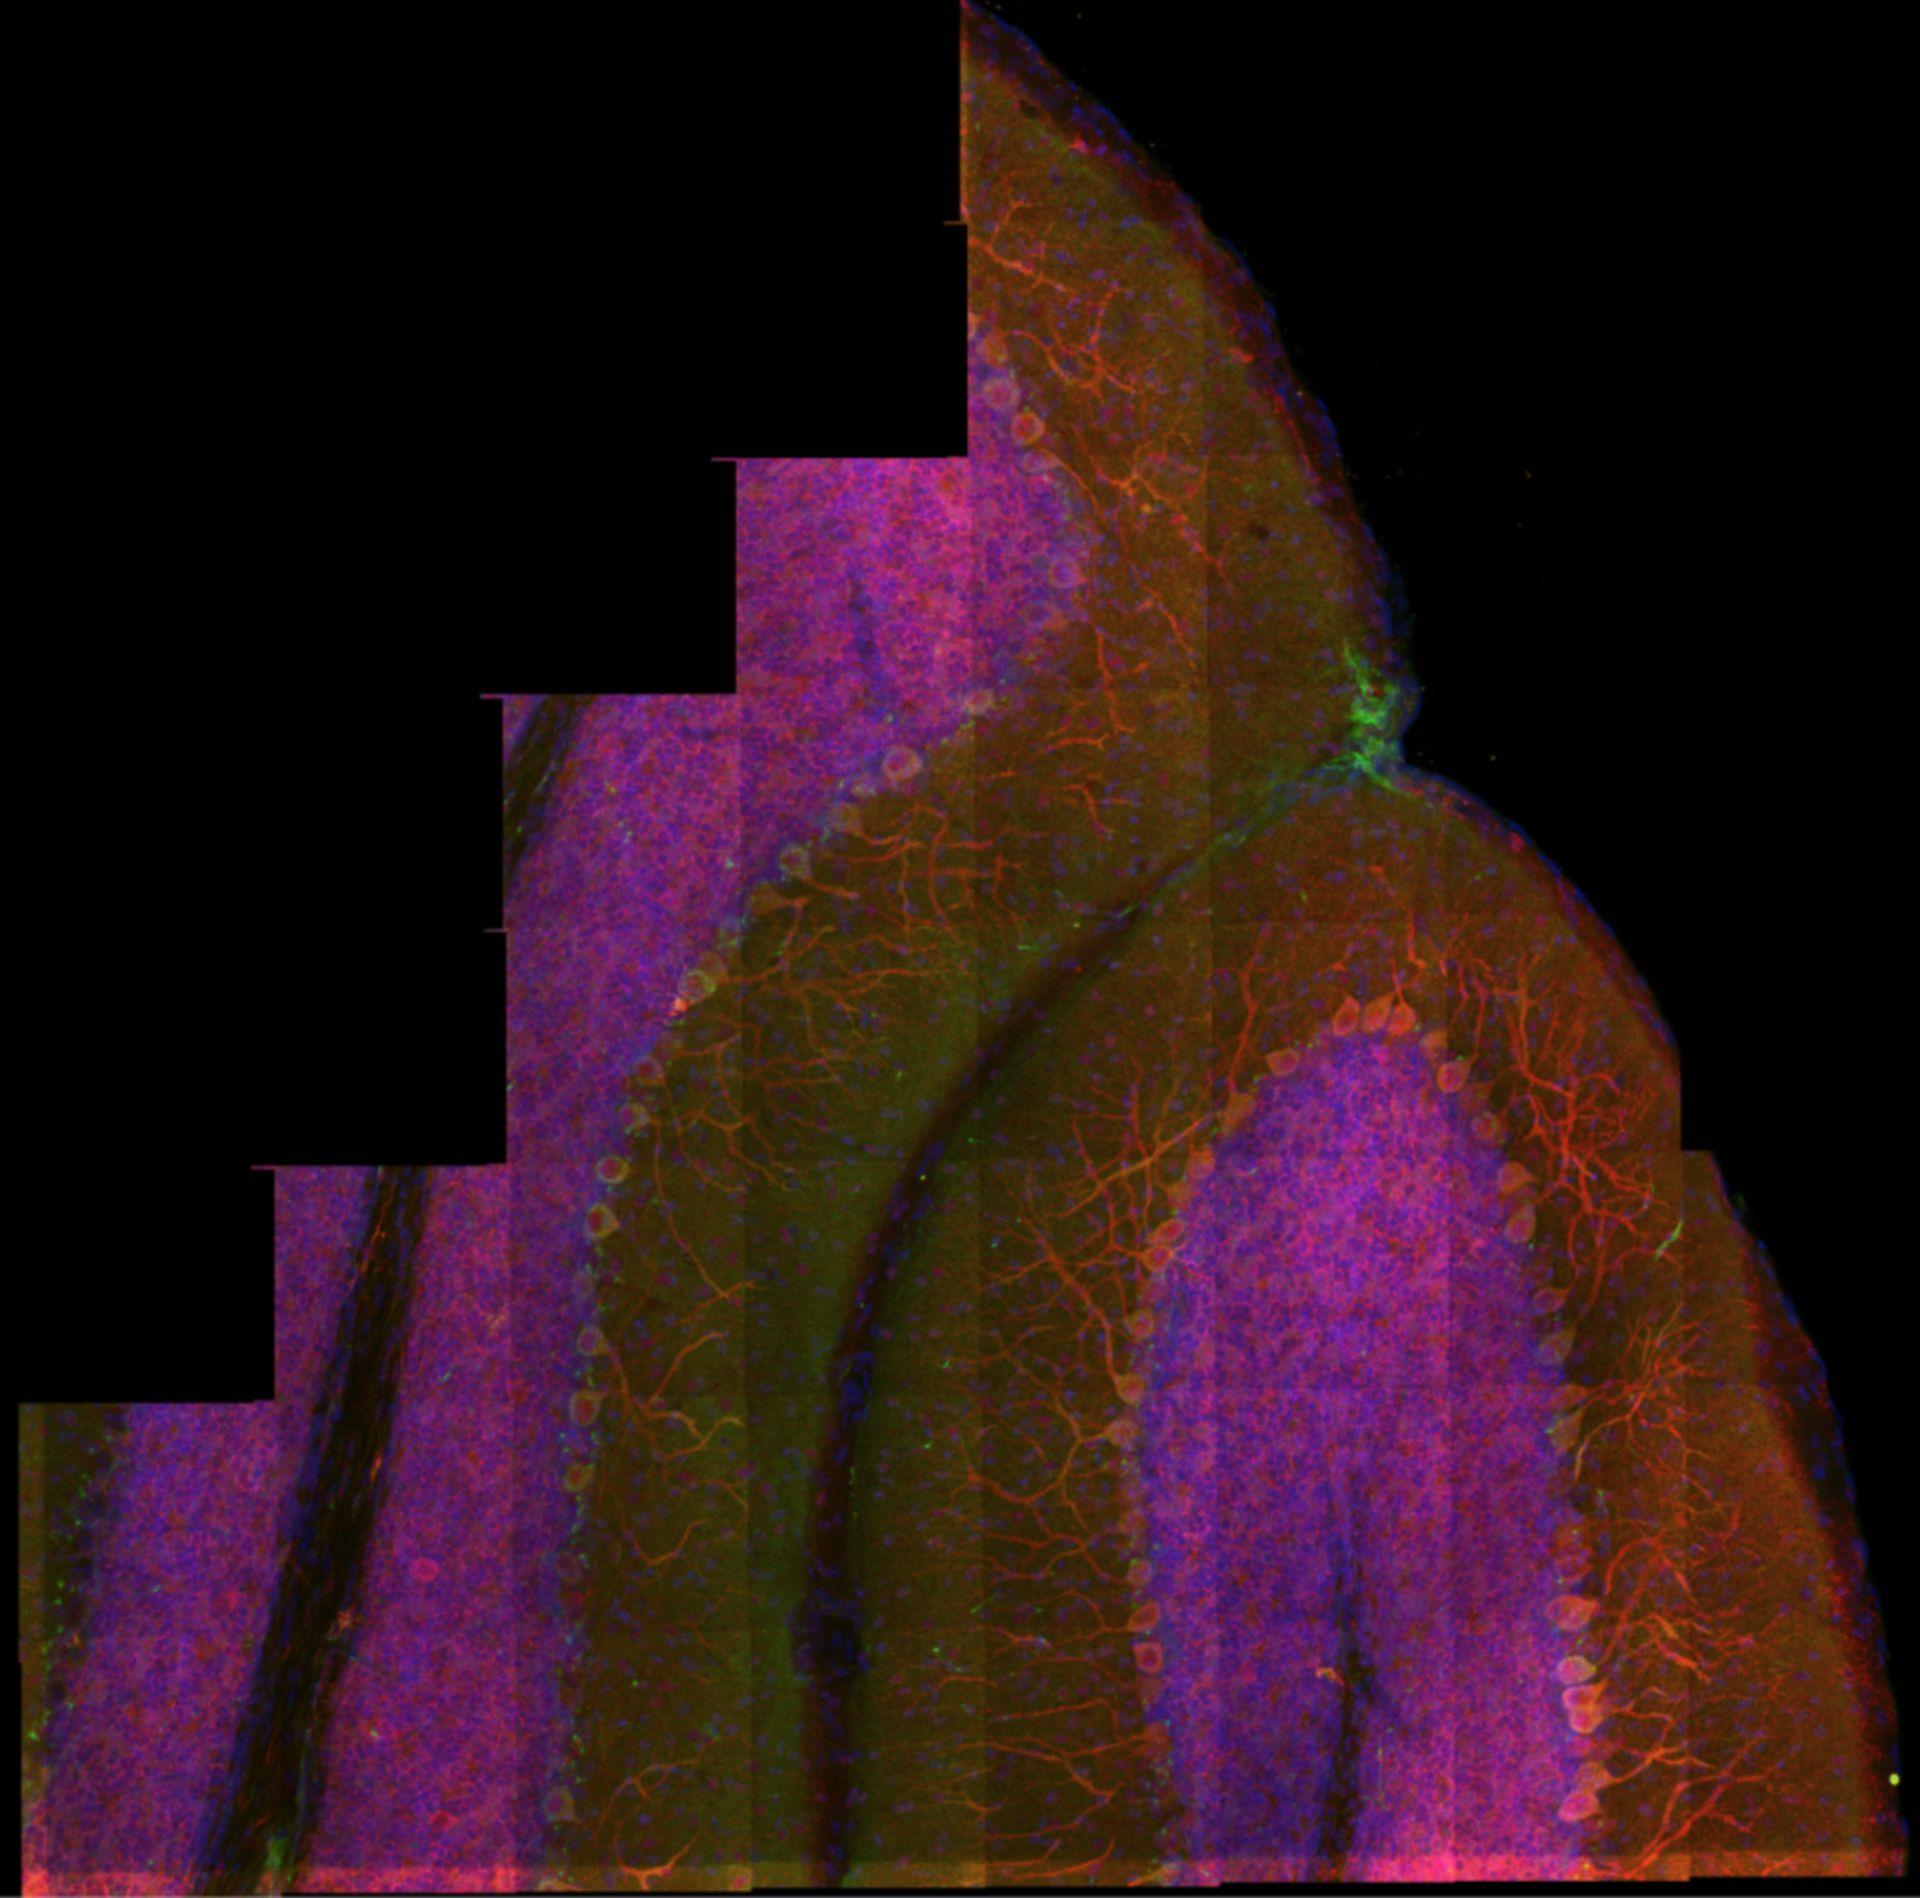 Kleinhirnrinde - Mikroskopie